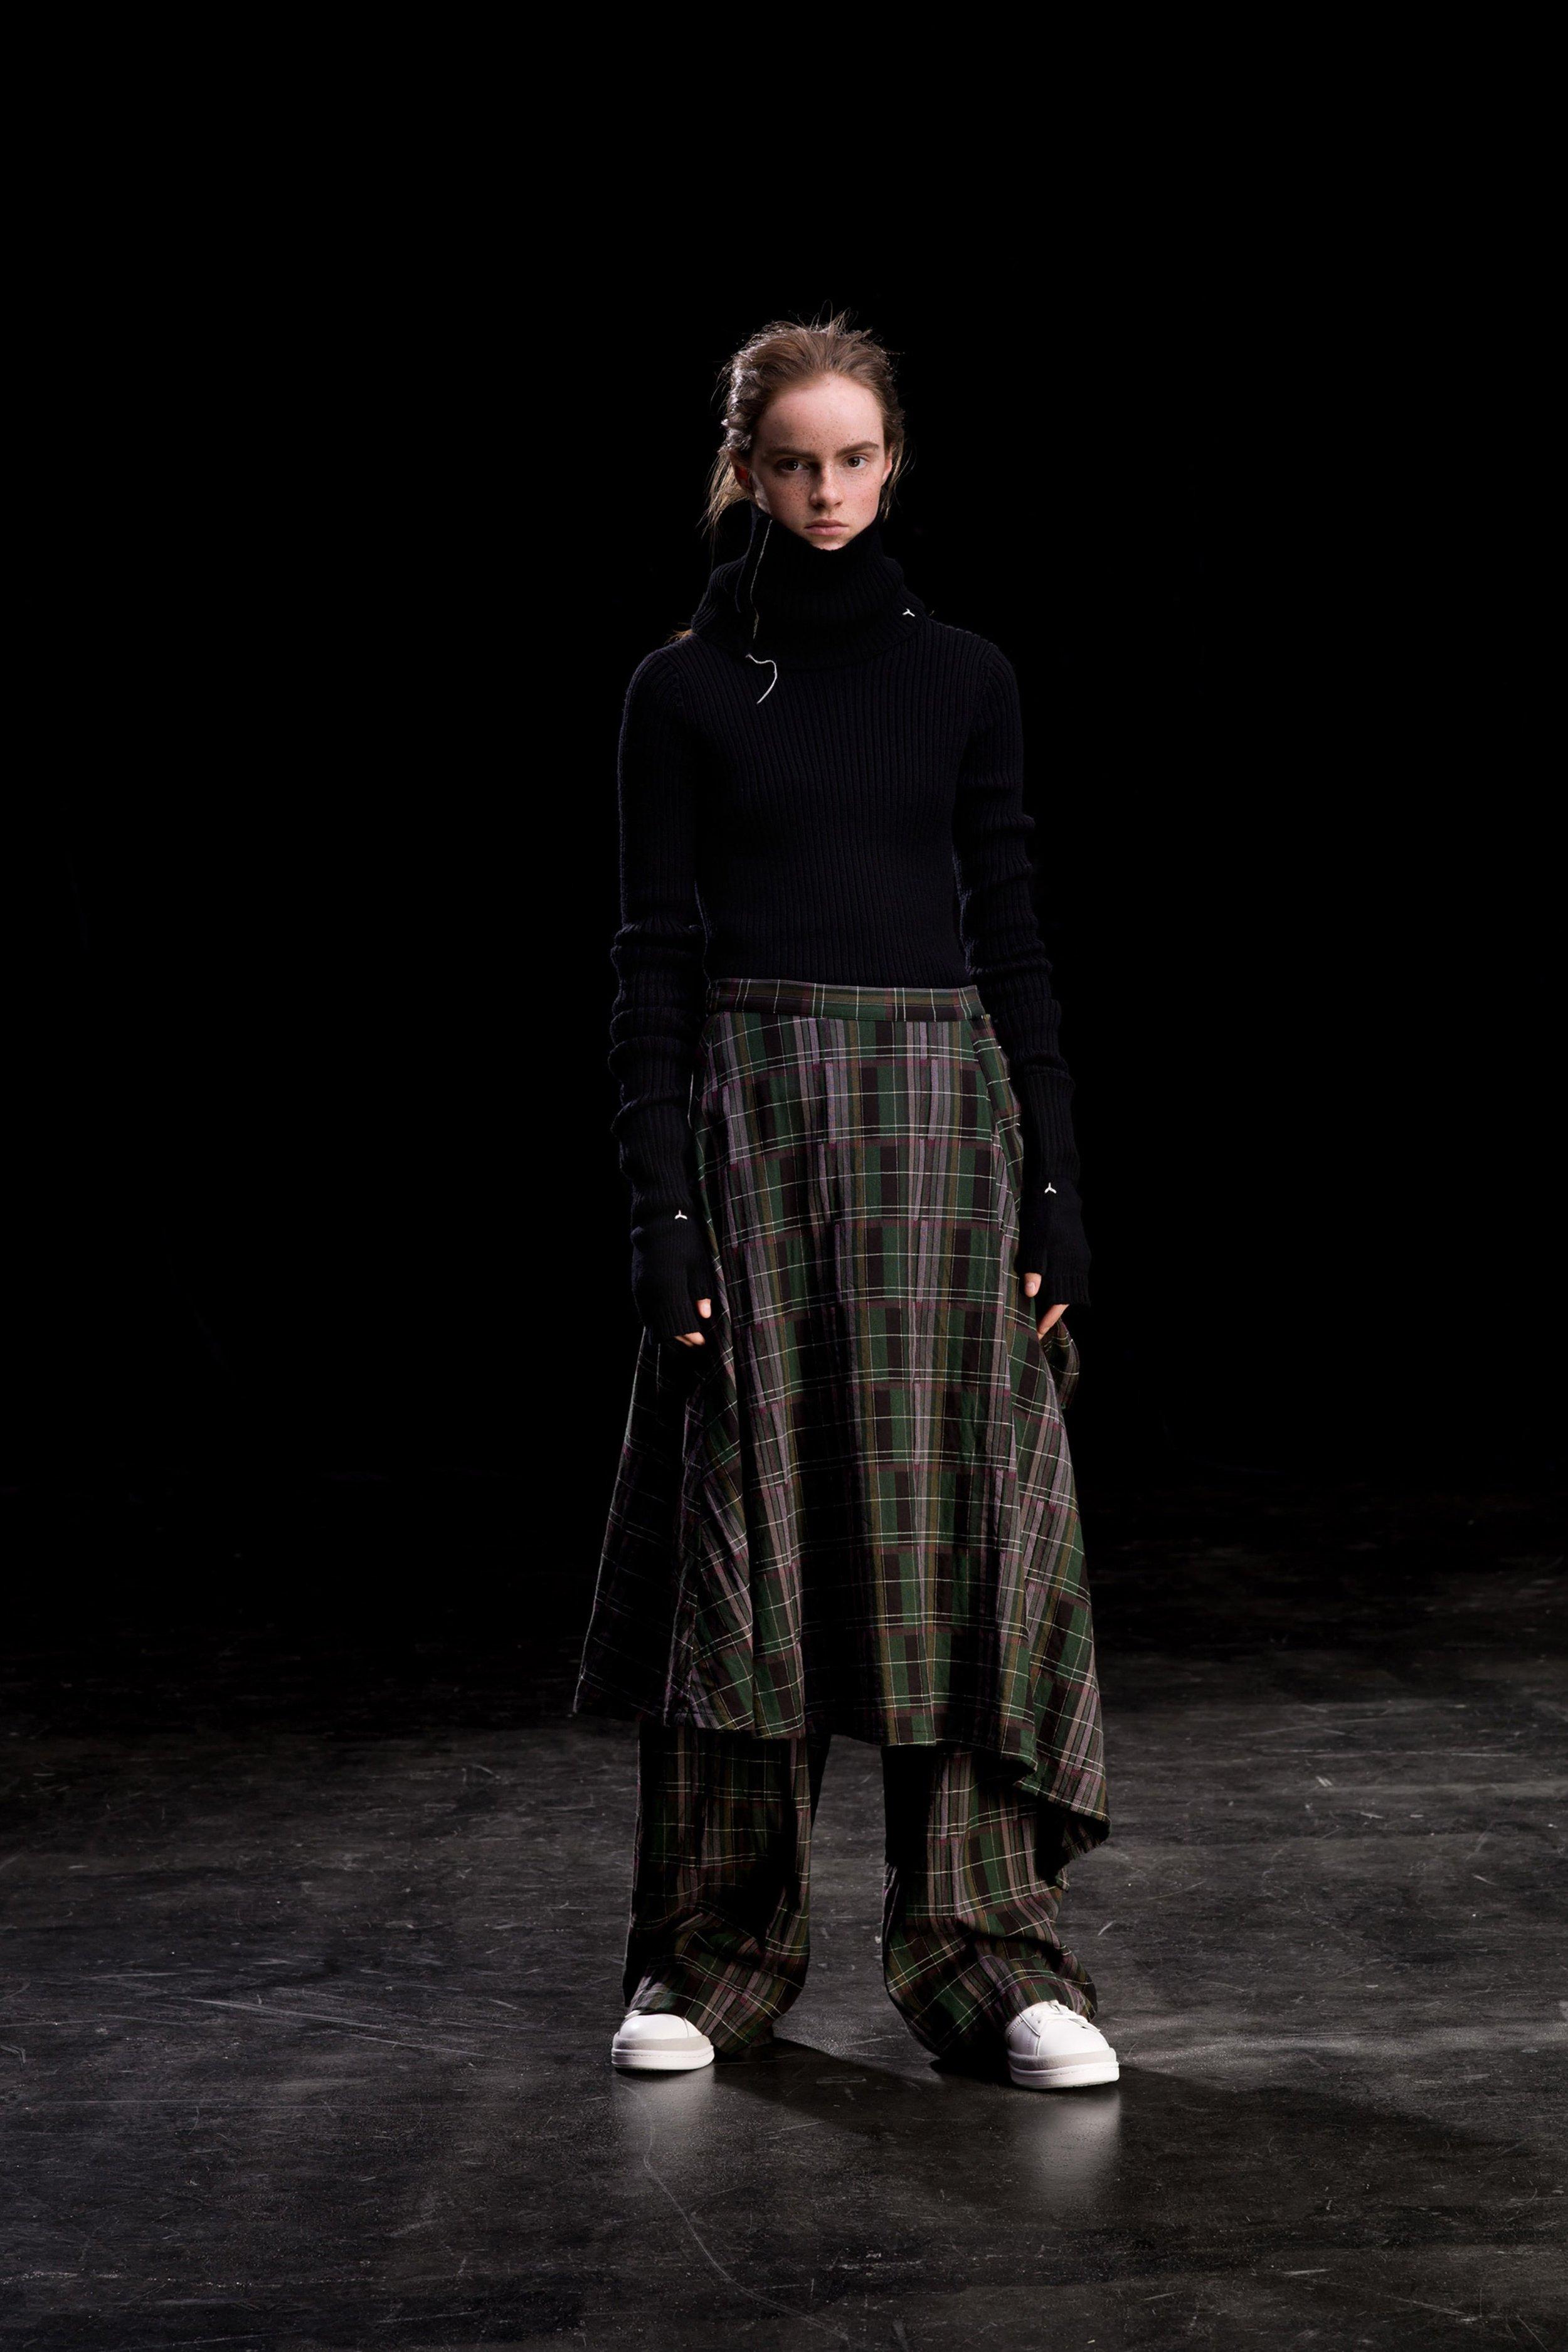 00017-Ys-Yohji-Yamamoto-FALL-19-Ready-To-Wear.jpg